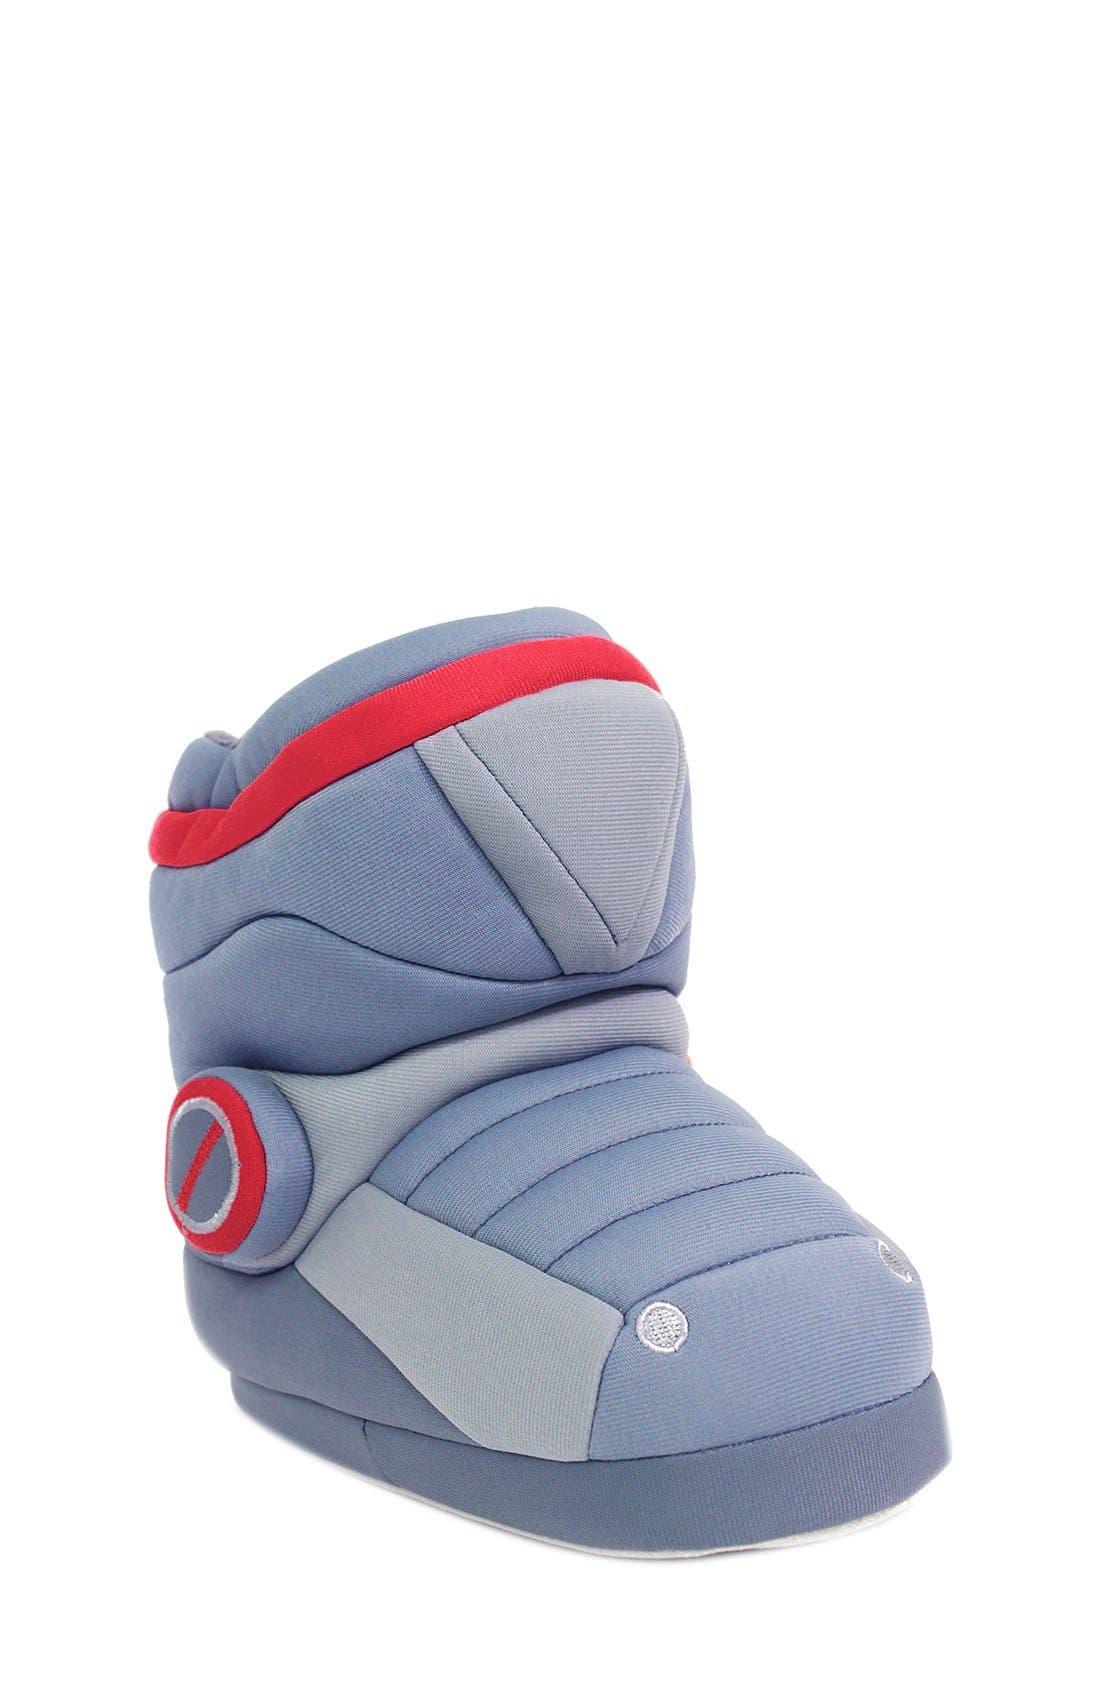 Trimfit Robot Slipper Boot (Toddler & Little Kid)